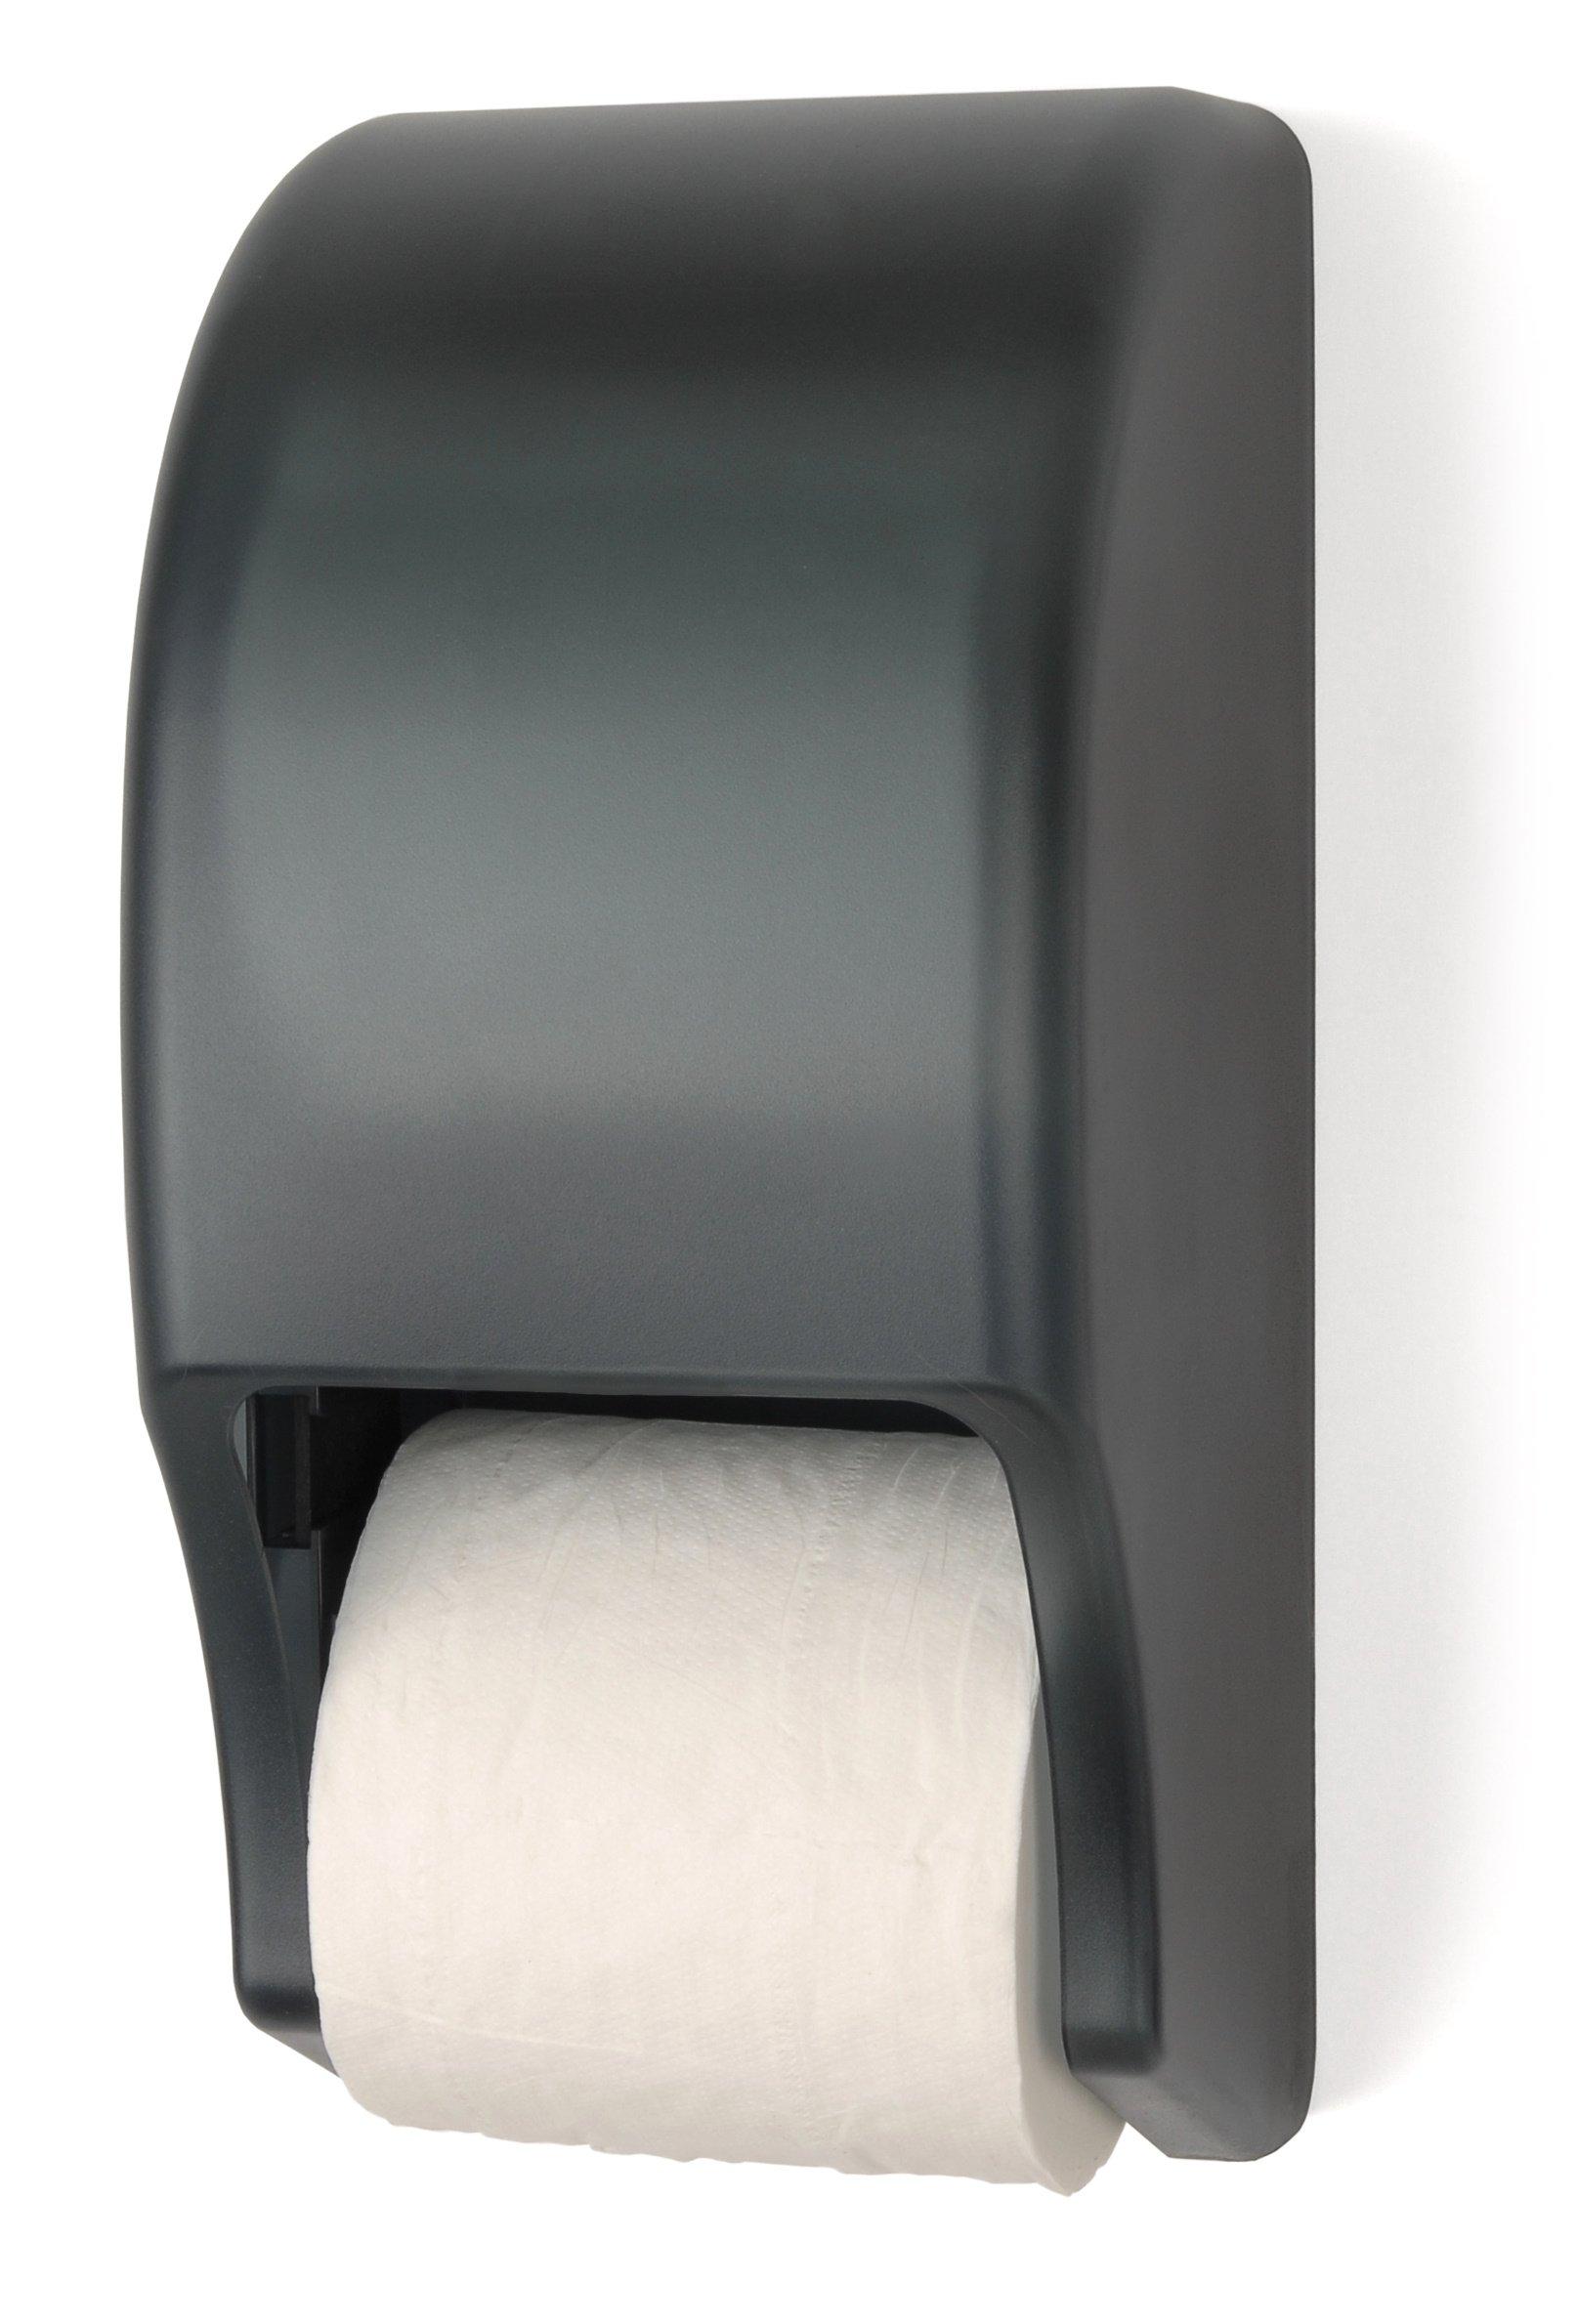 Palmer Fixture RD0028-01 Two-Roll Standard Tissue Dispenser, Dark Translucent by Palmer Fixture